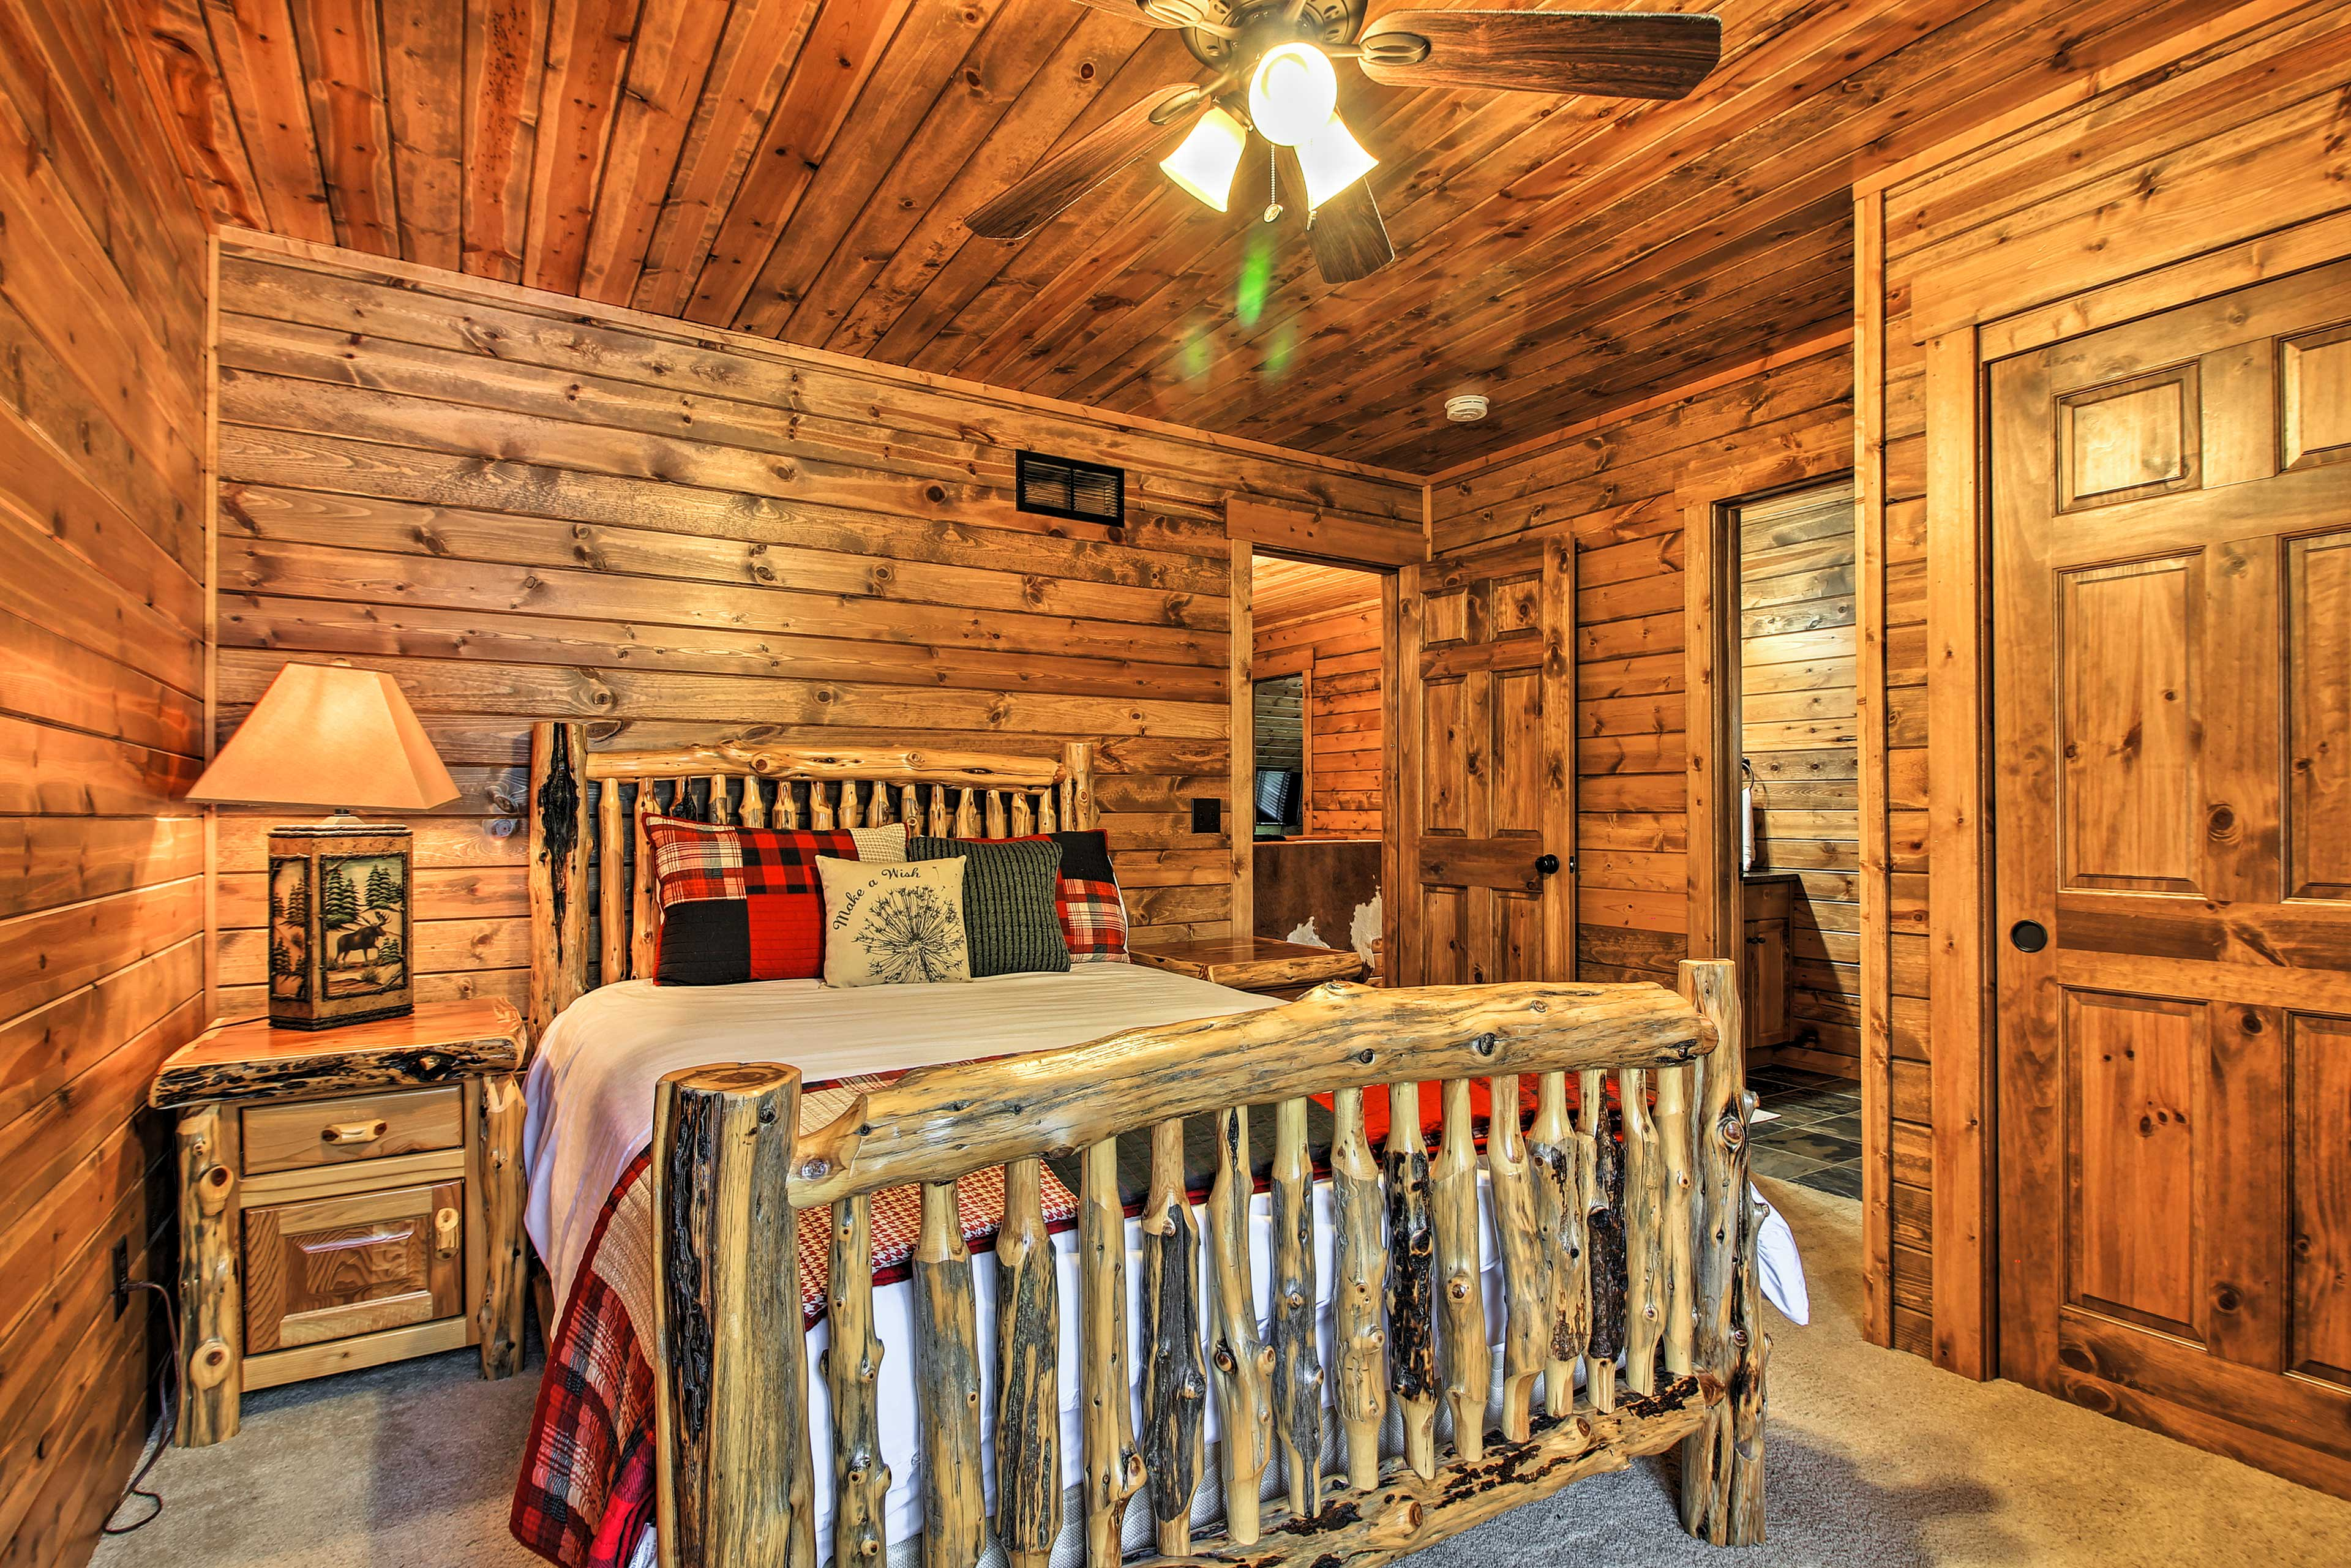 Rustic bedrooms set a relaxing environment.